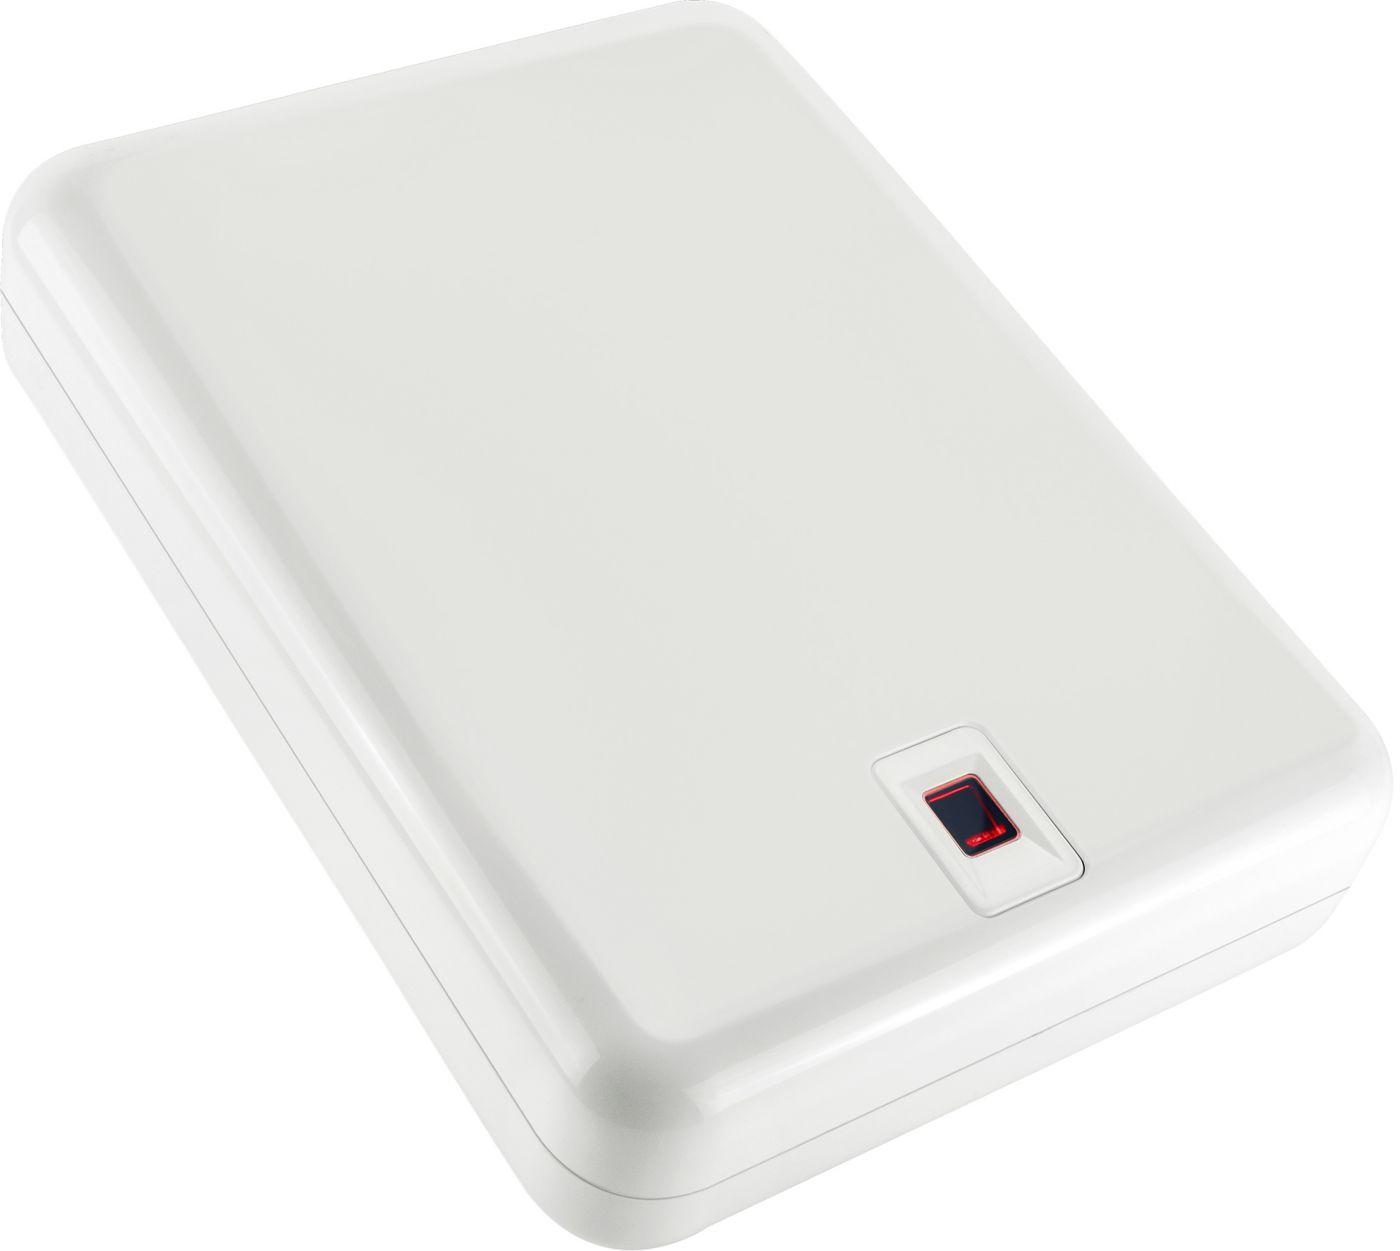 Barska iBOX Portable Lock Box with Biometric Lock